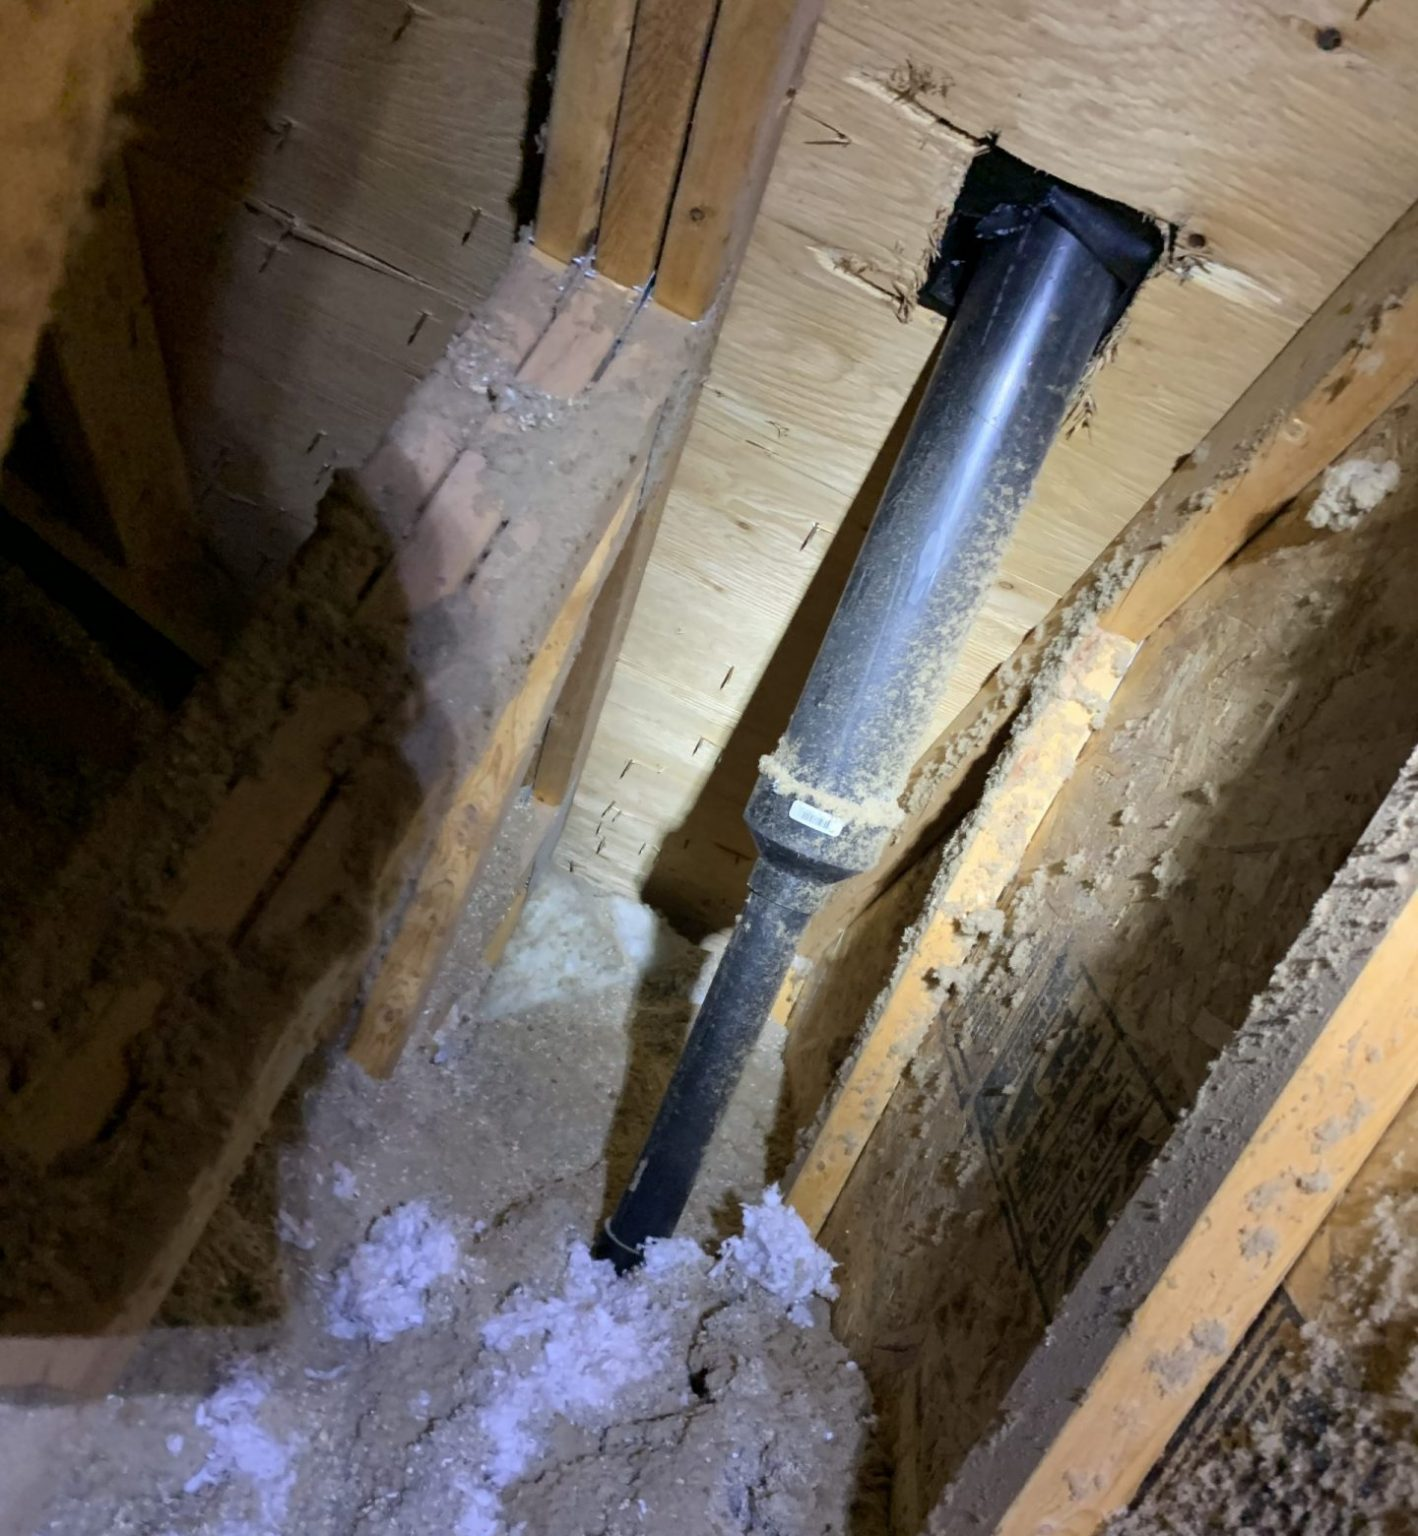 Roof Pipe In Attic